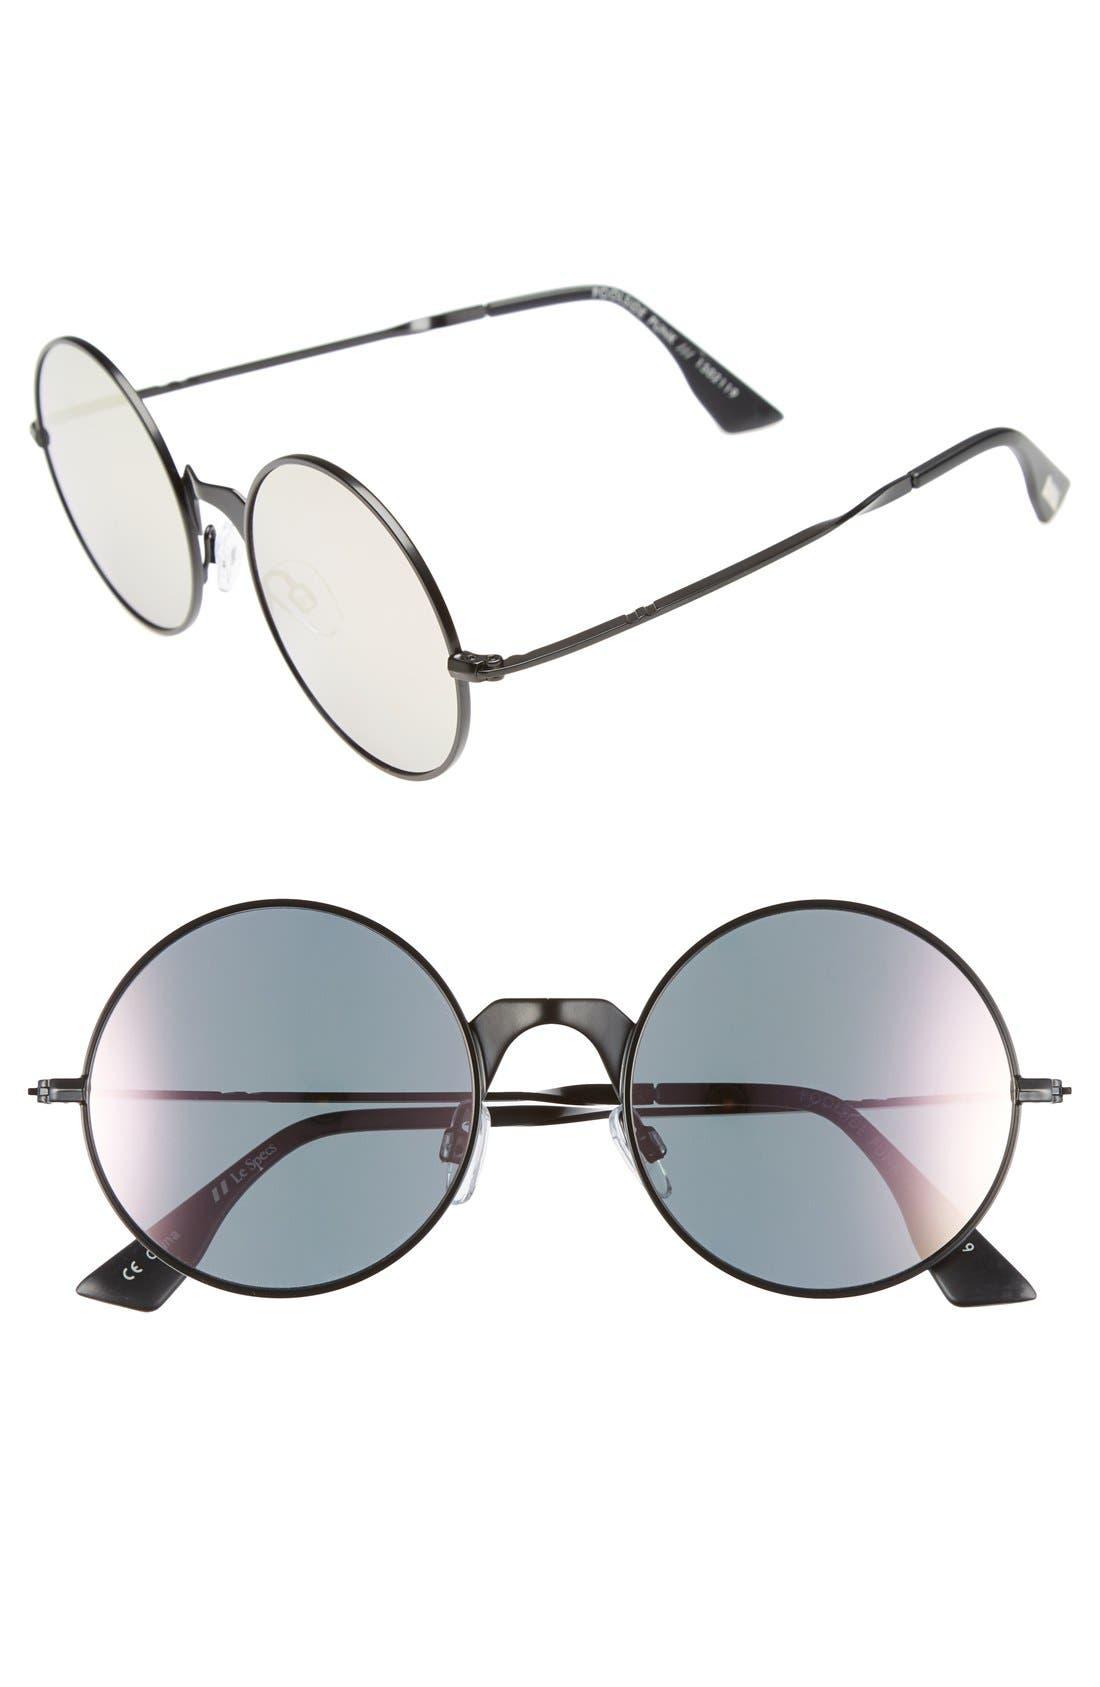 Alternate Image 1 Selected - Le Specs 'Poolside Punk' 53mm Retro Sunglasses